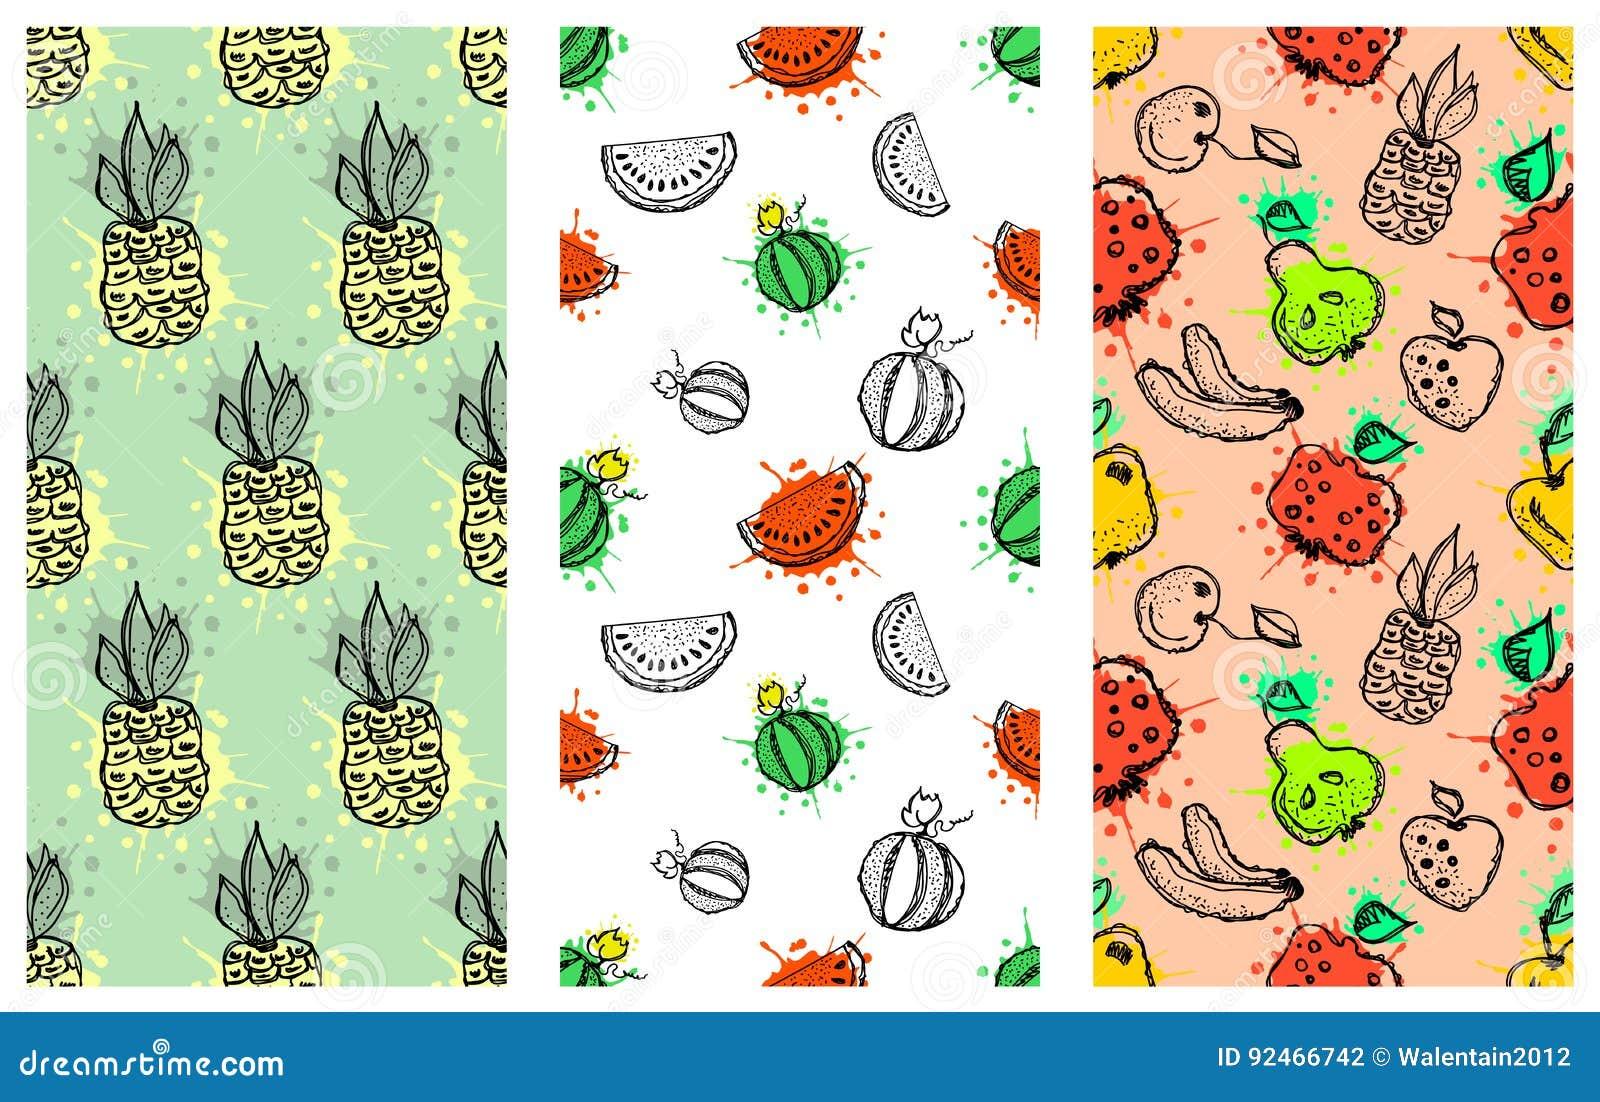 Set Seamless Vector Patterns Hand Drawn Fruits Illustration Colorful Cherry Apple Pear Watermelon Pomegranate Banana Berry Natural Fresh Fruit Juice Retro